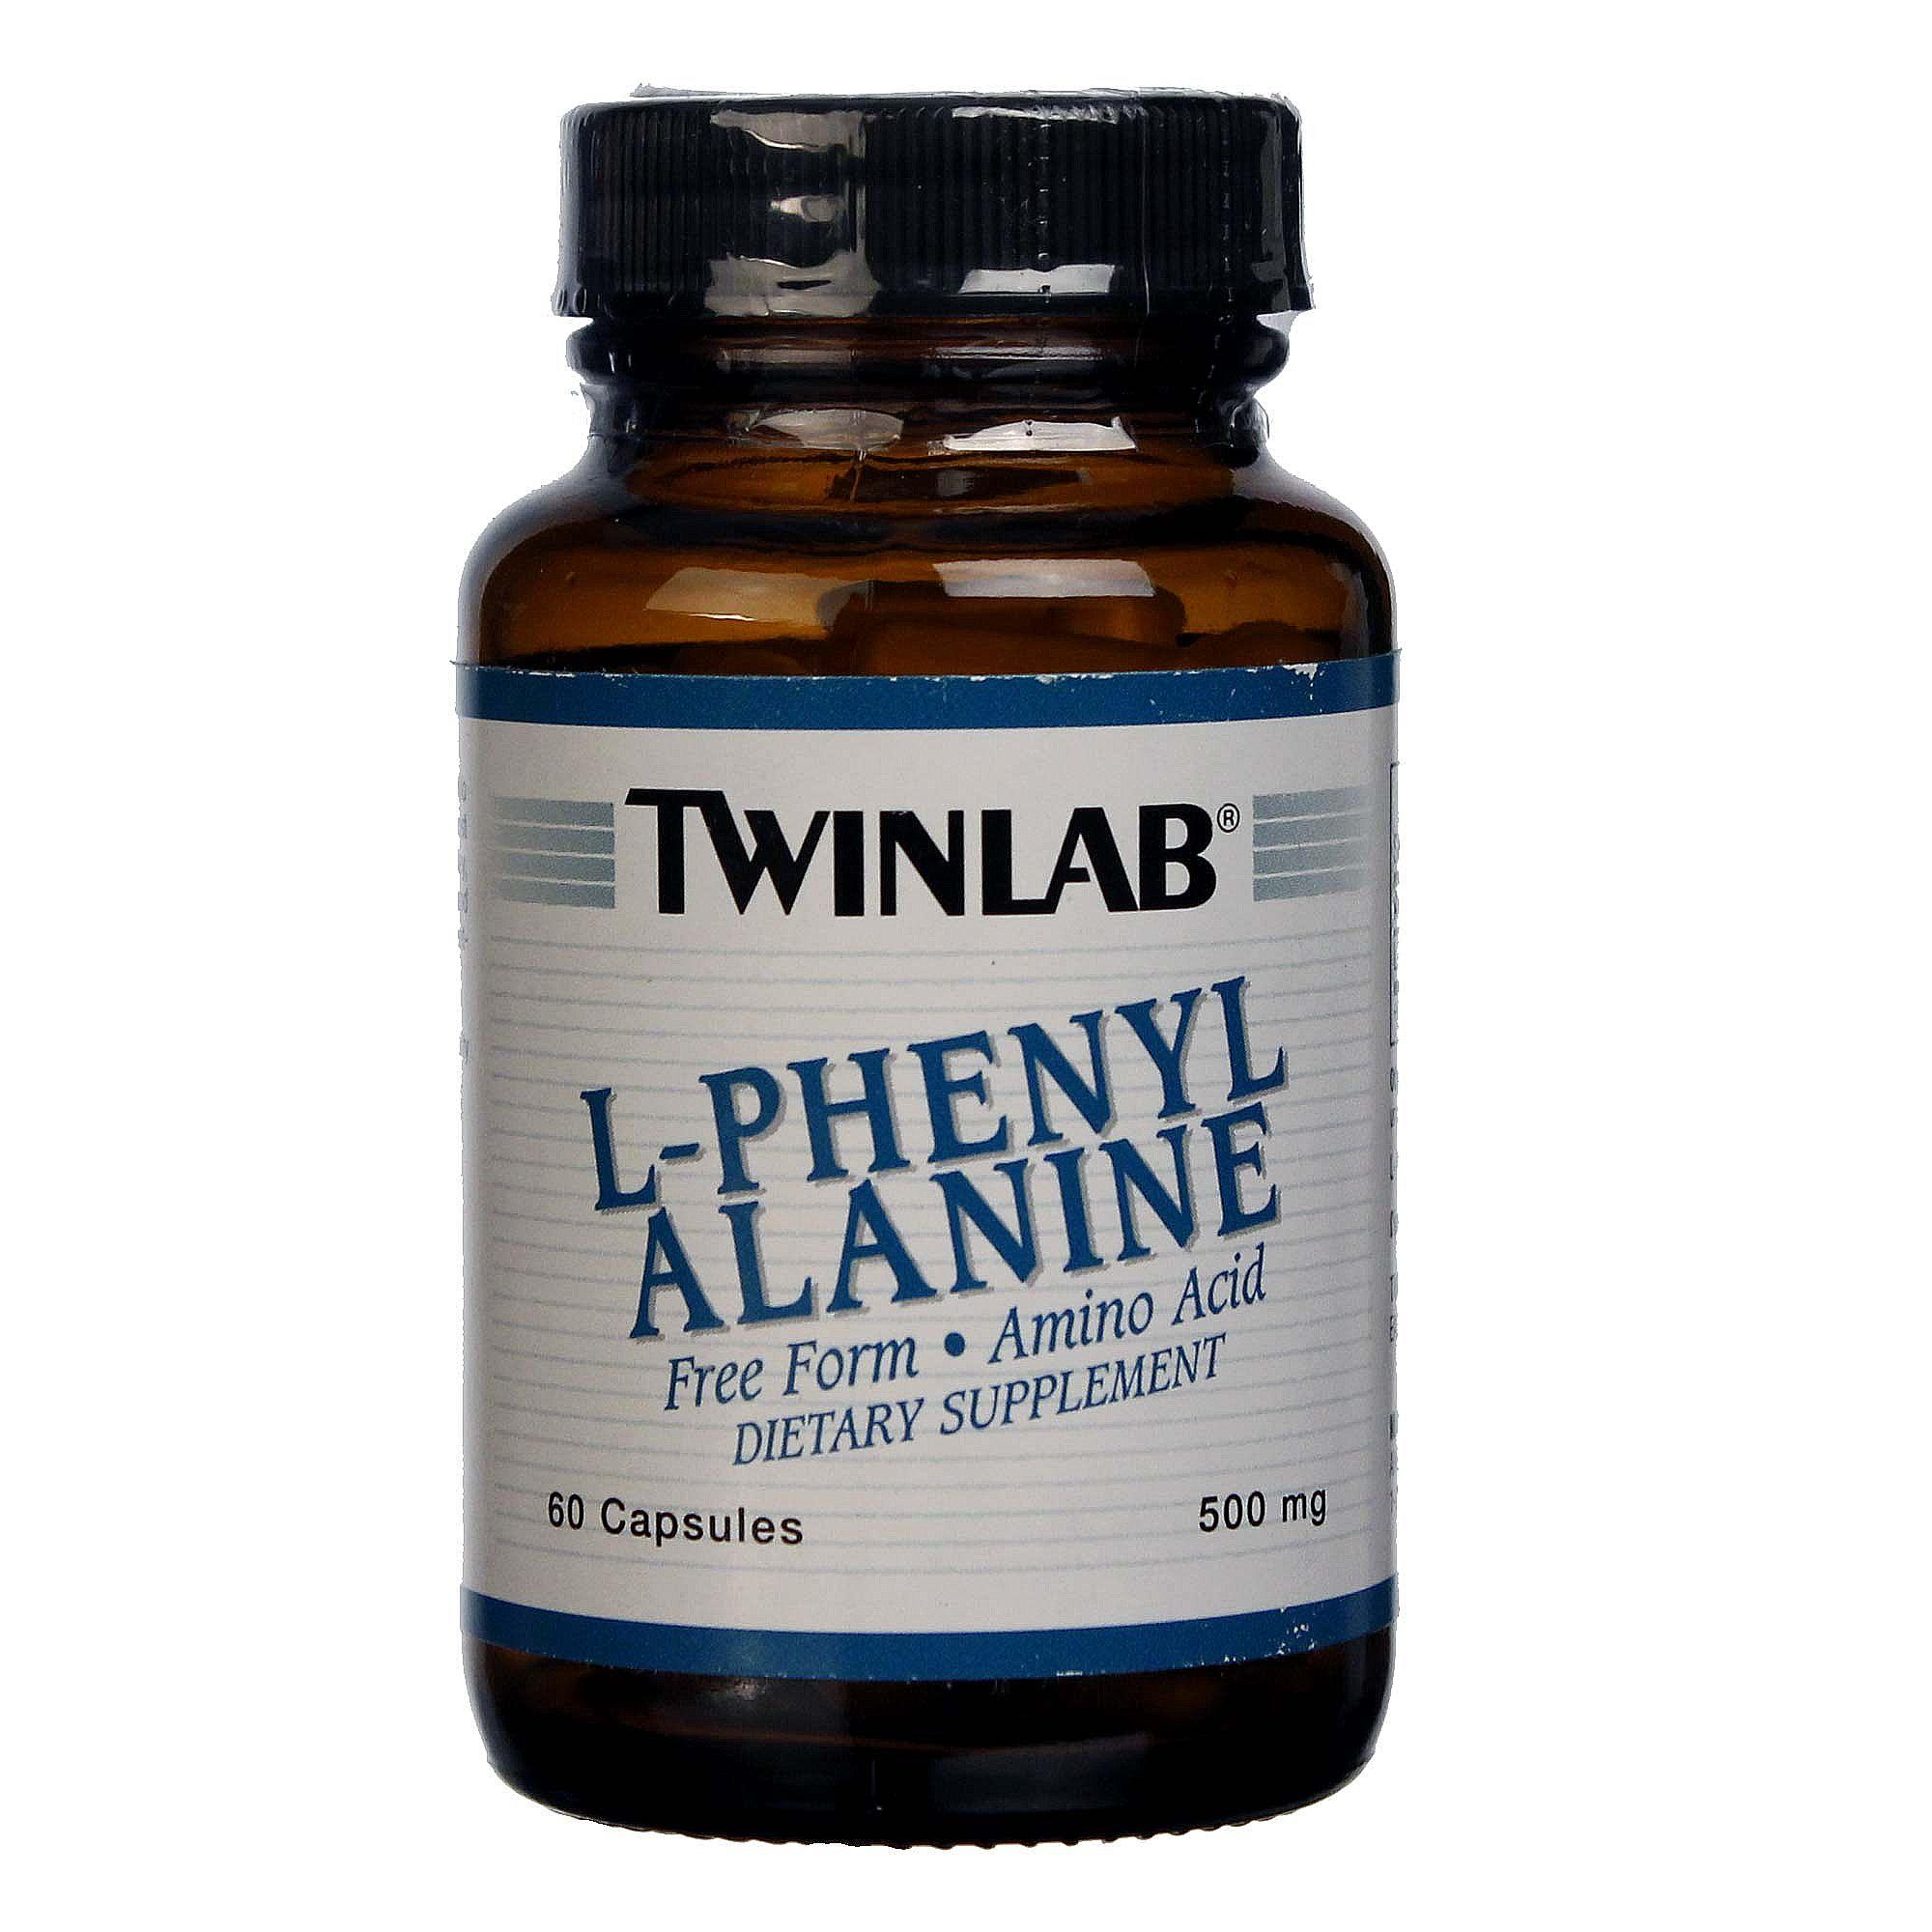 Twinlab L-Phenylalanine 500 mg - 60 Capsules - eVitamins.com